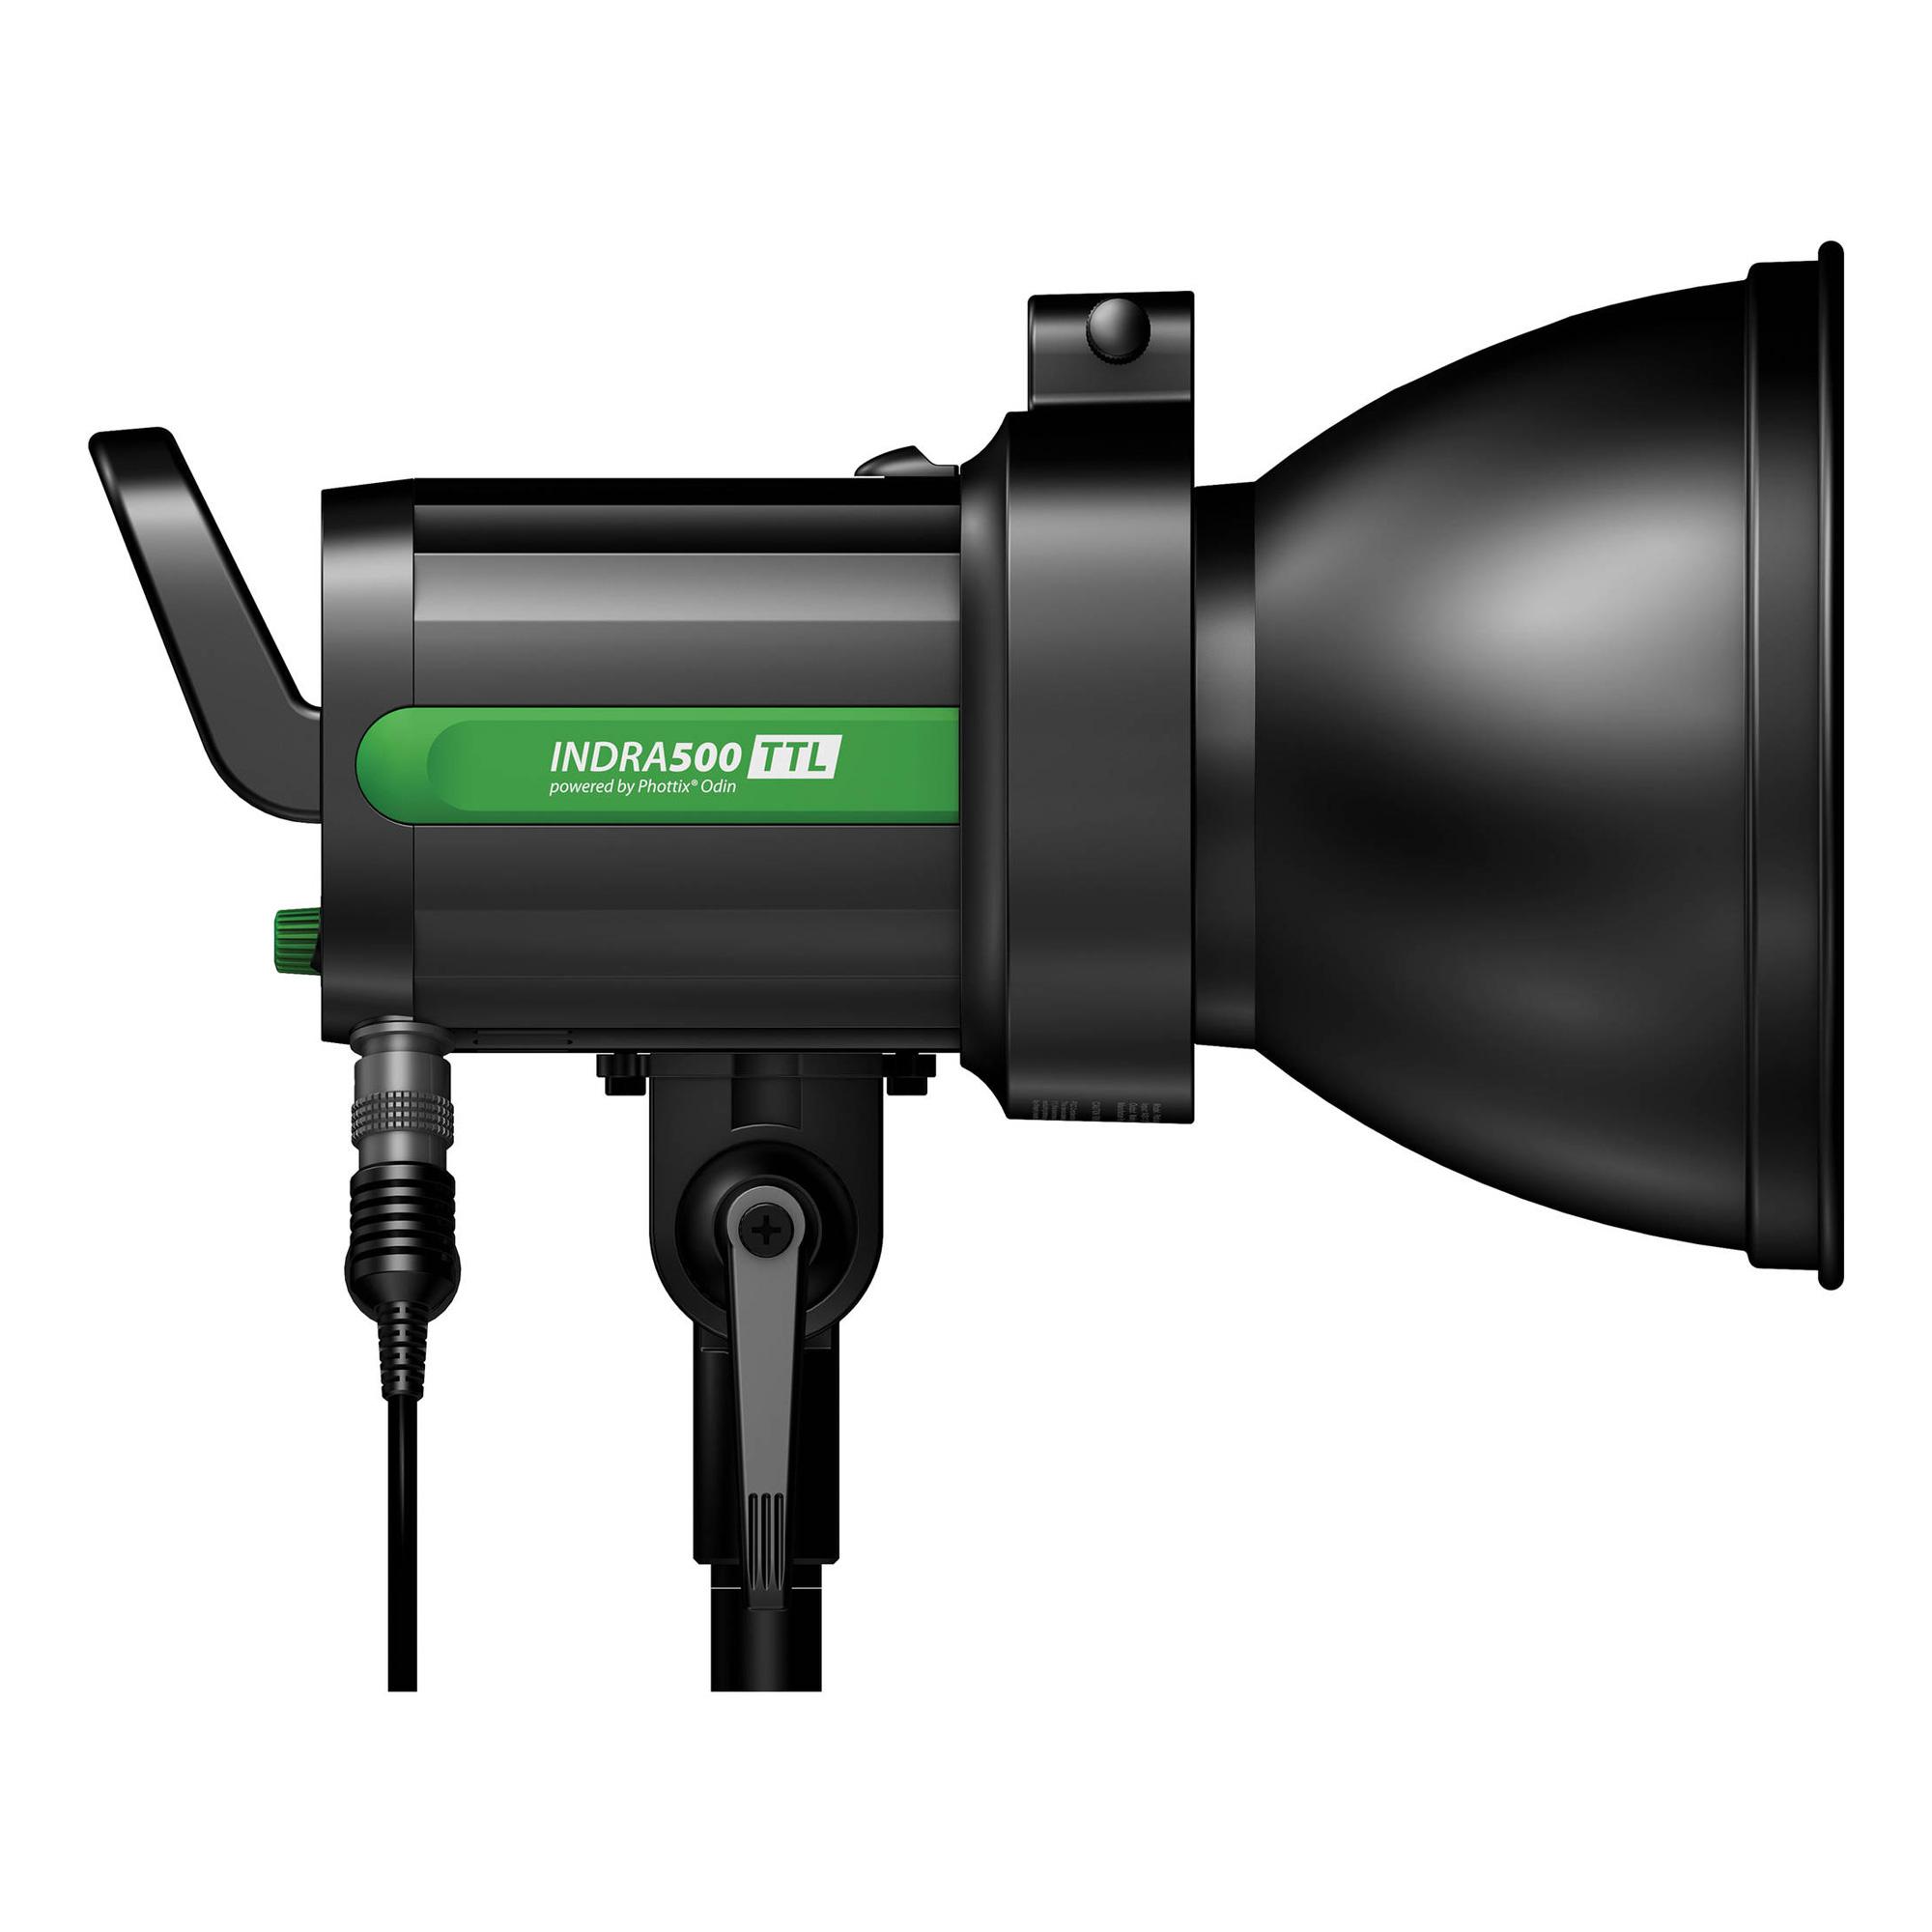 Indra500 TTL Studio Light